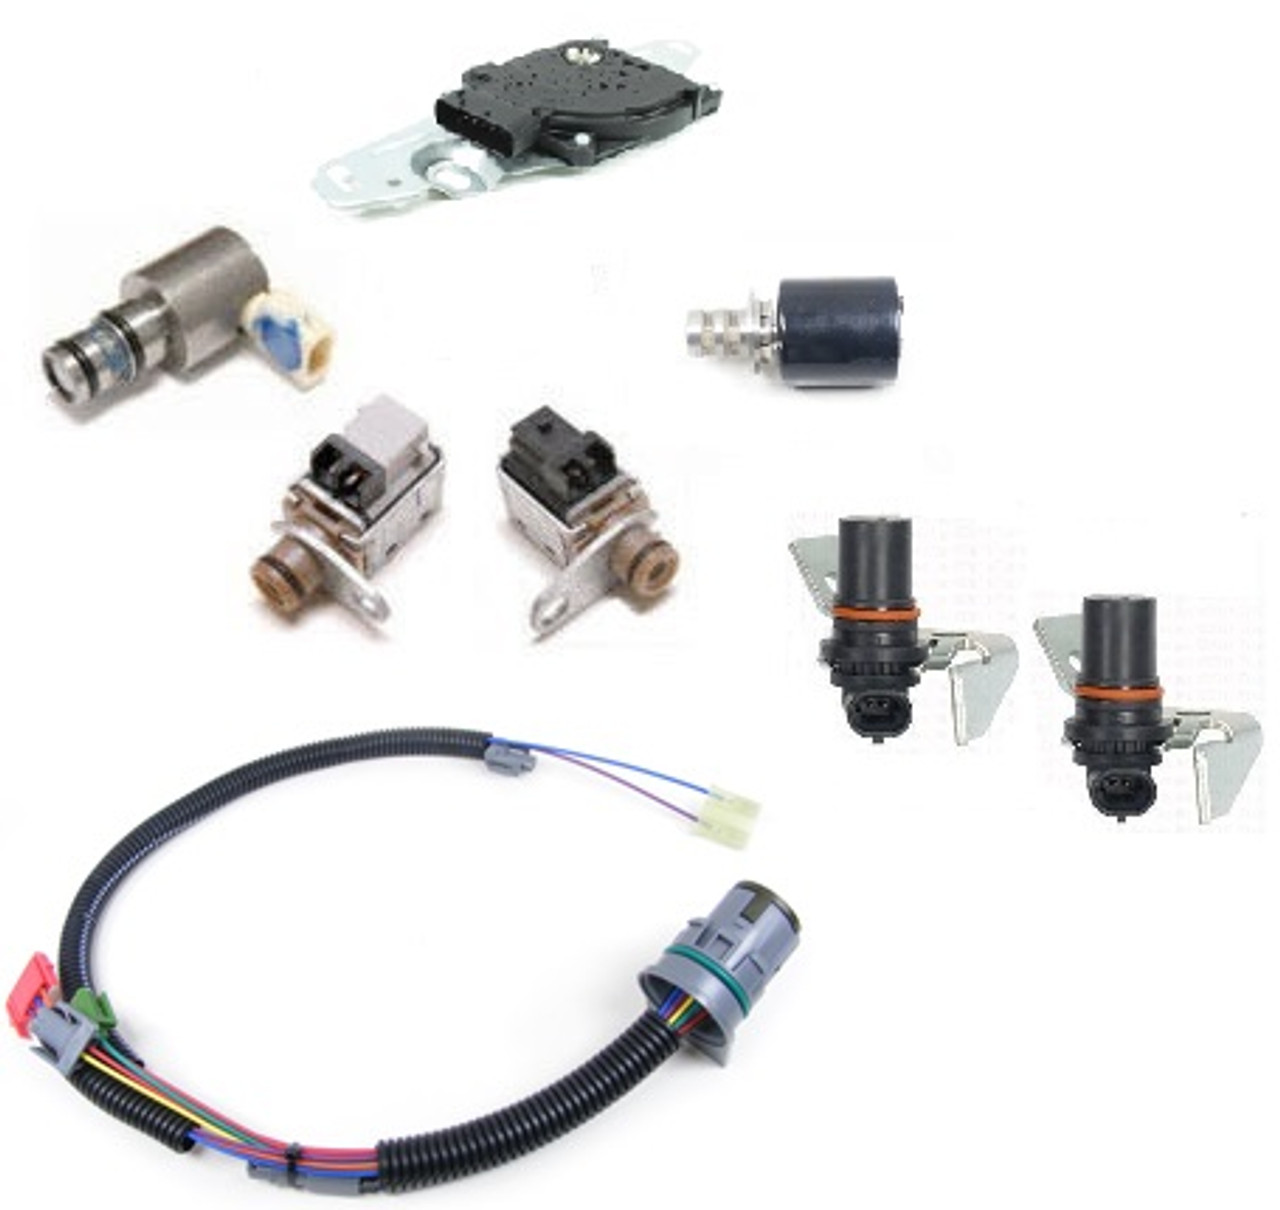 4l80e Transmission Solenoids  Switch  Wire Harness